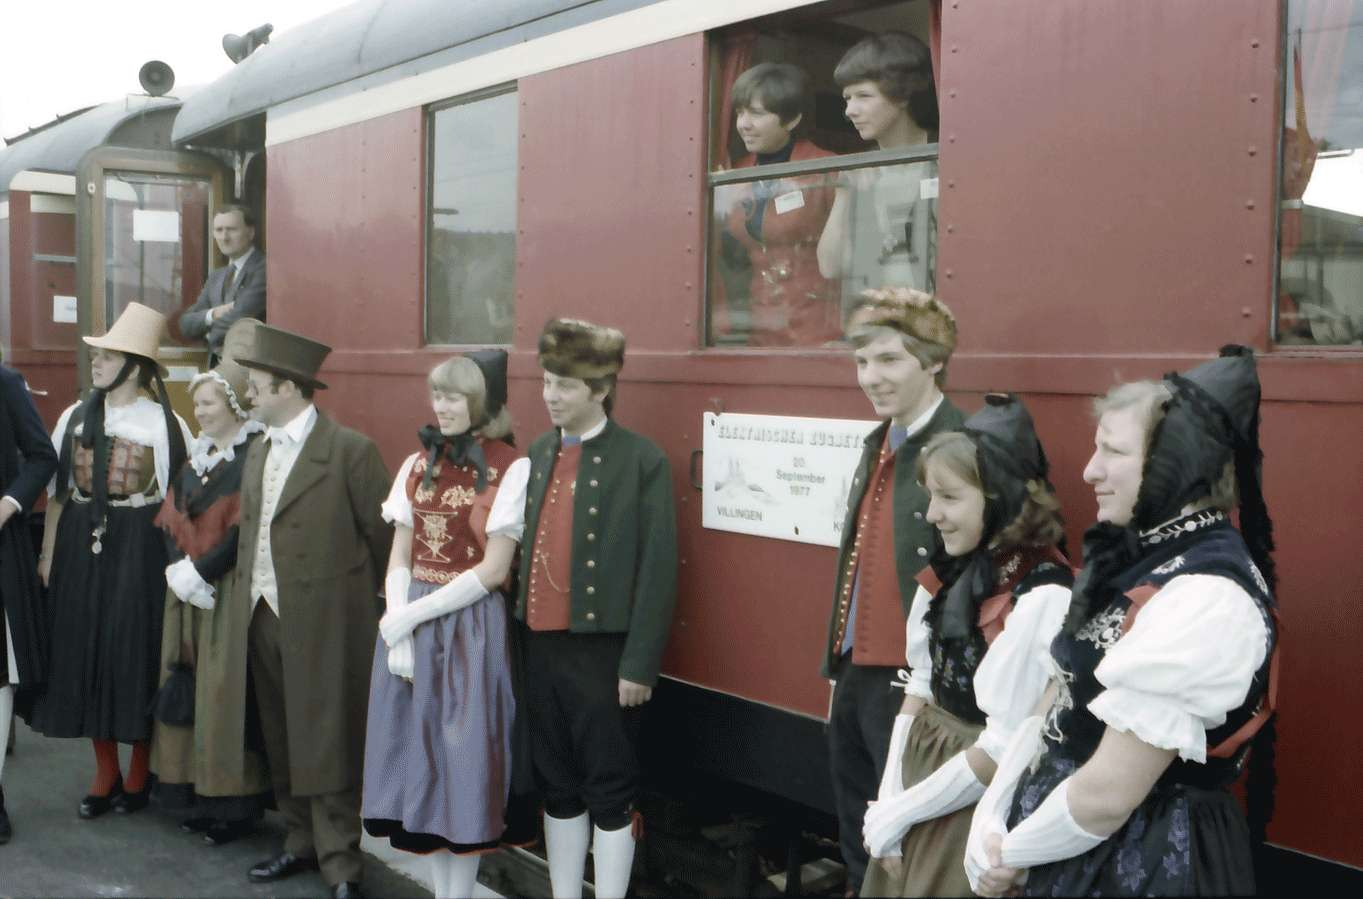 Immendingen: Trachtengruppe vor Zug, Bild 1